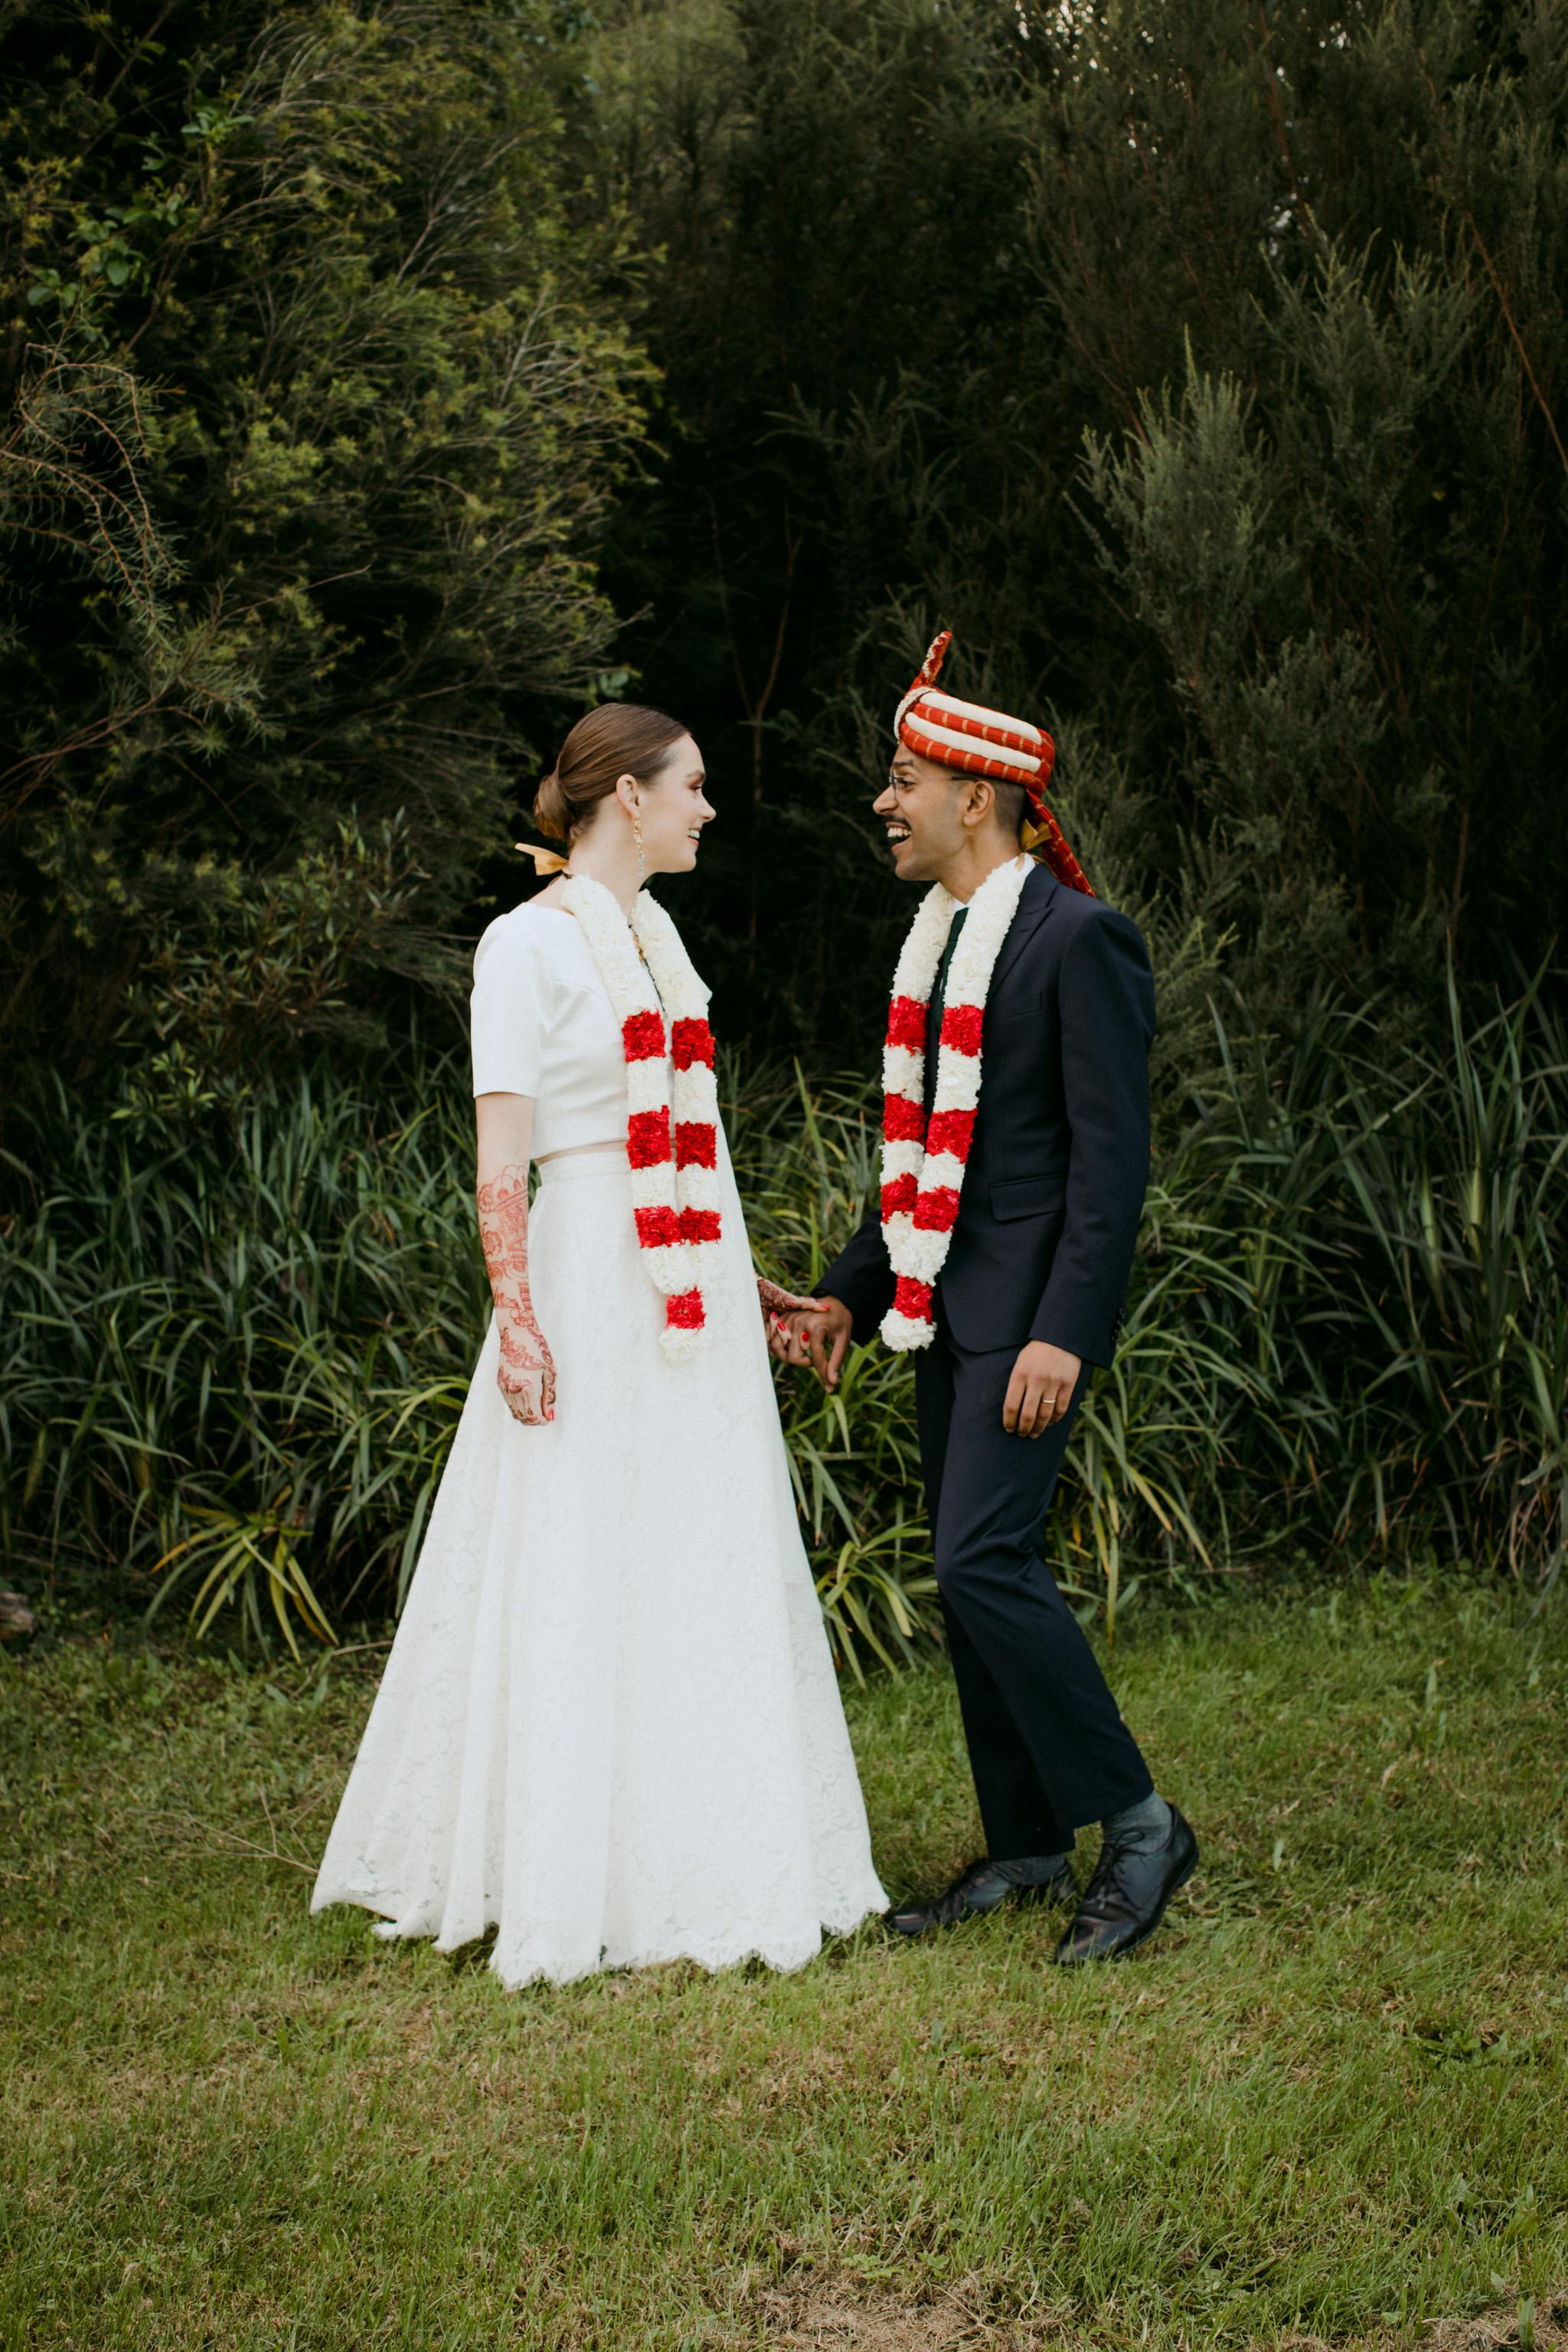 Amelia+Ani_Wedding_May2019_credit_OneDaySomewherePhotography-85.jpg